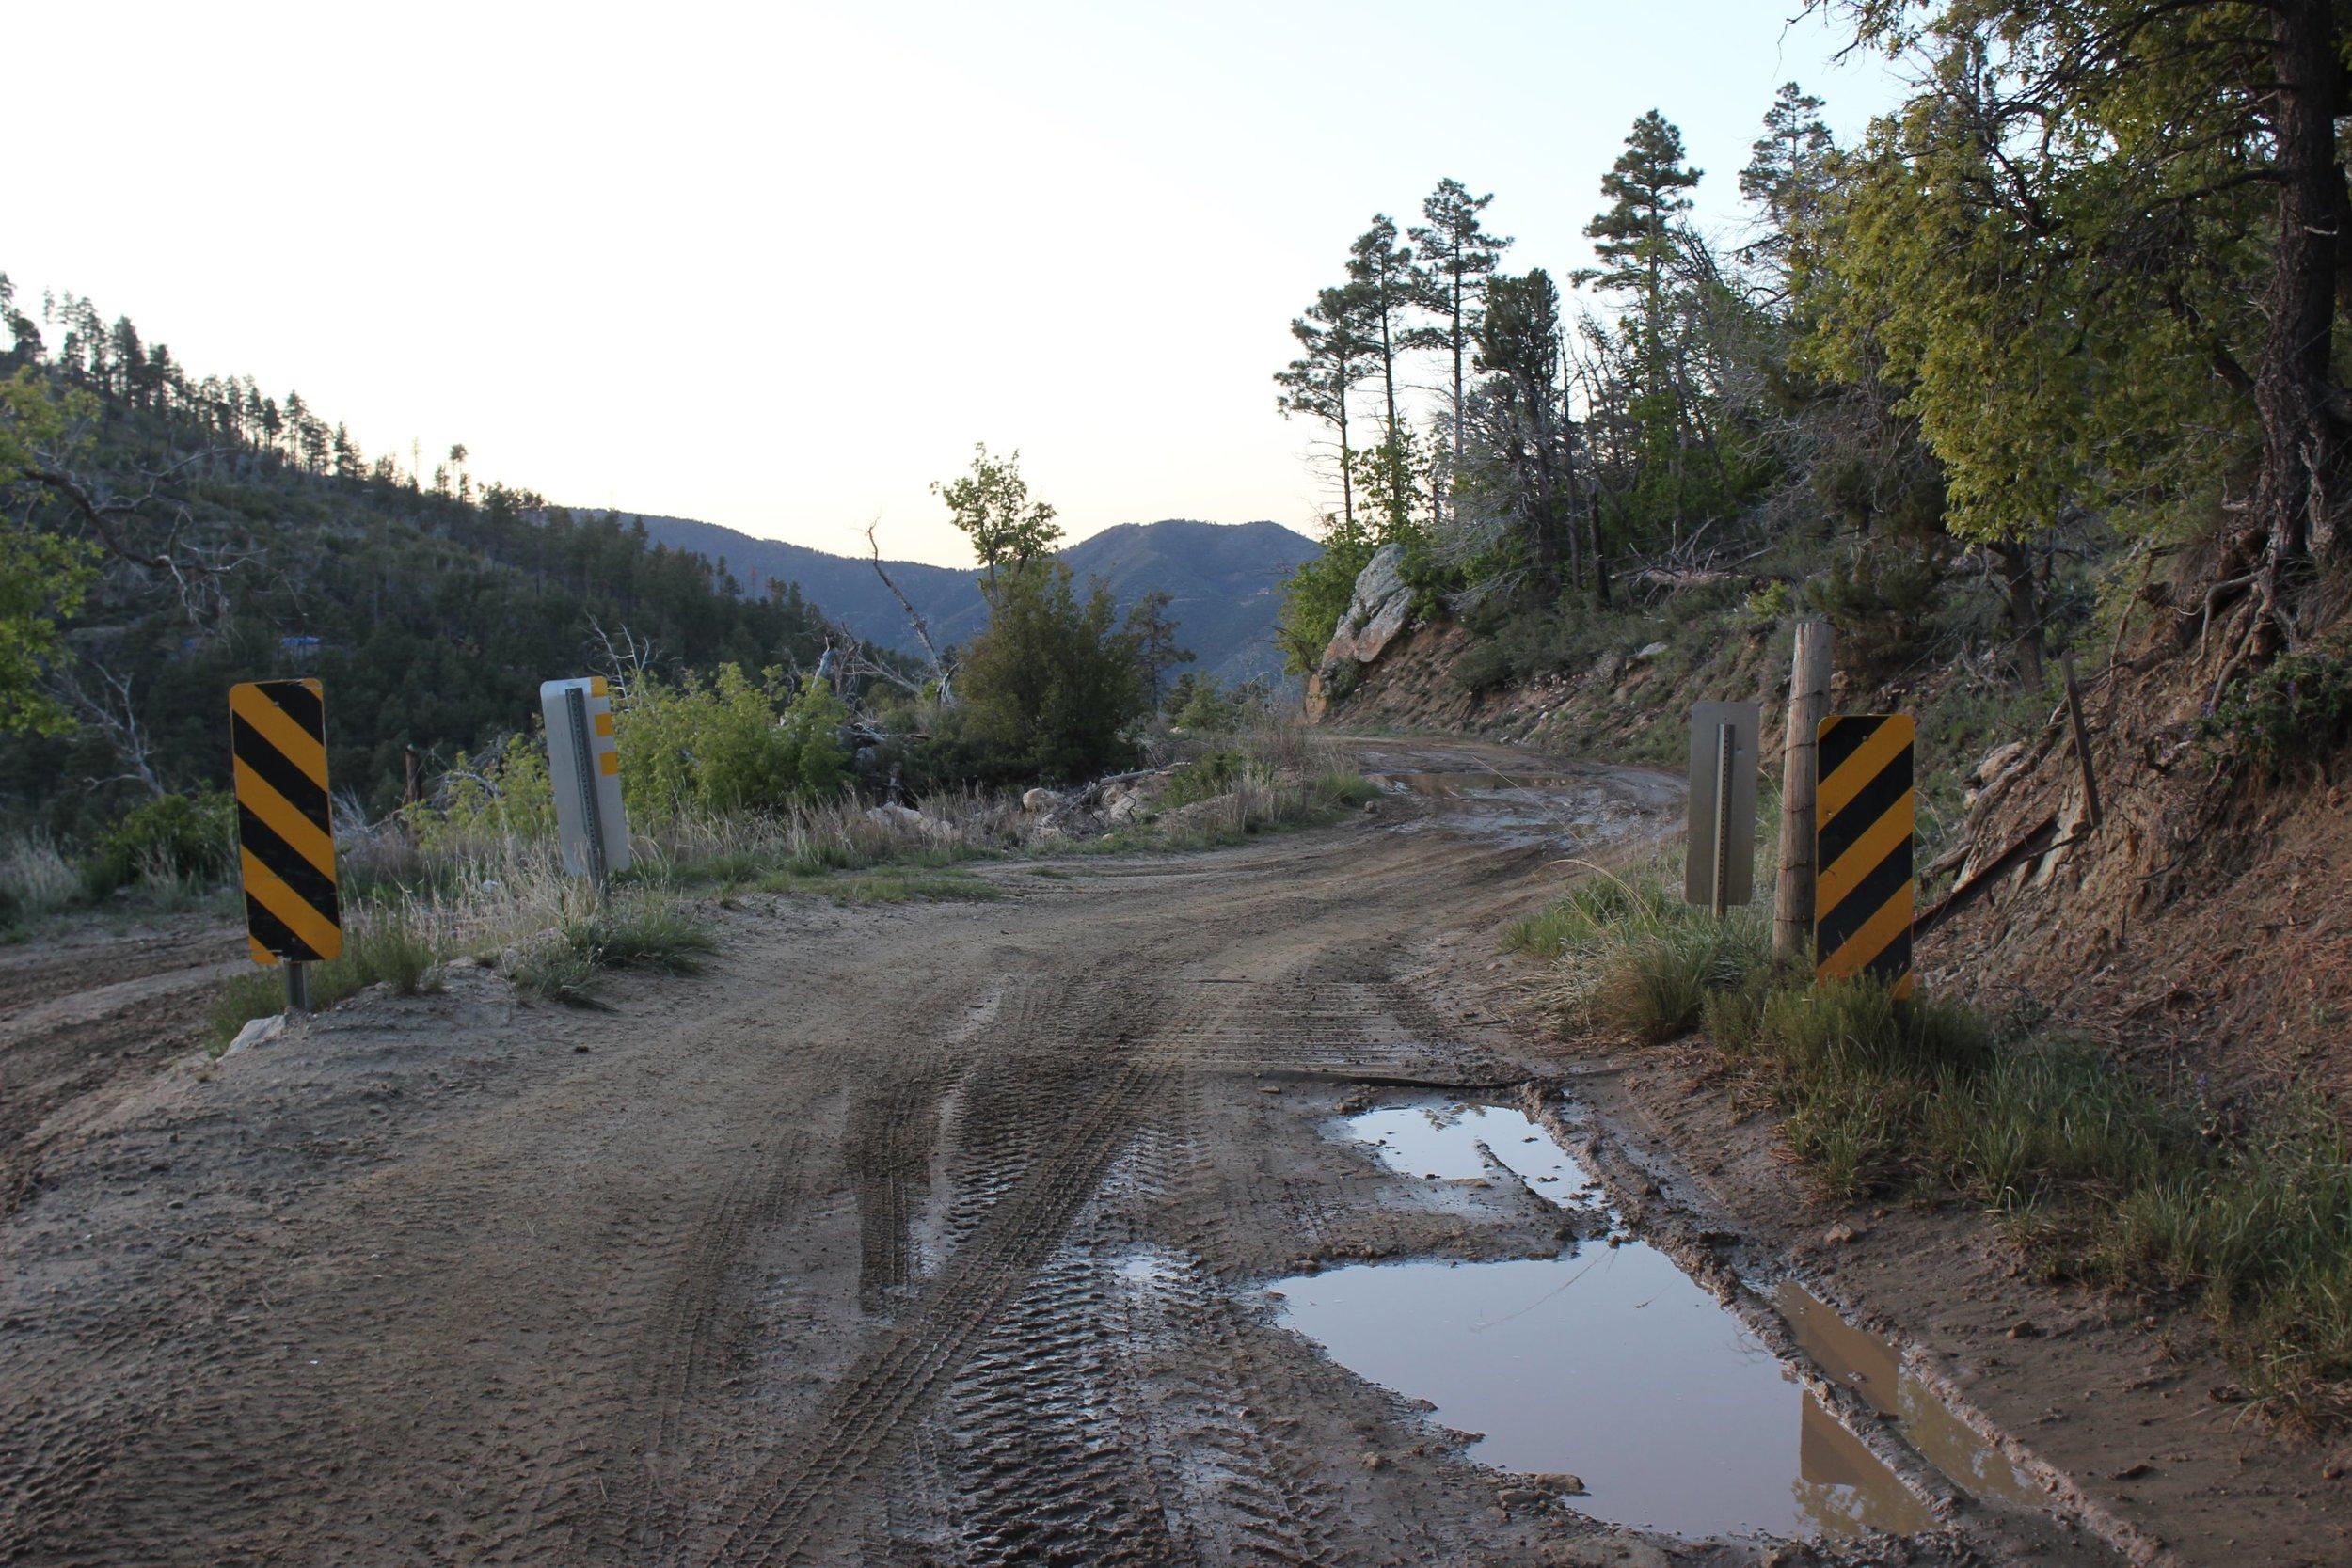 The trail to Horsethief Lake